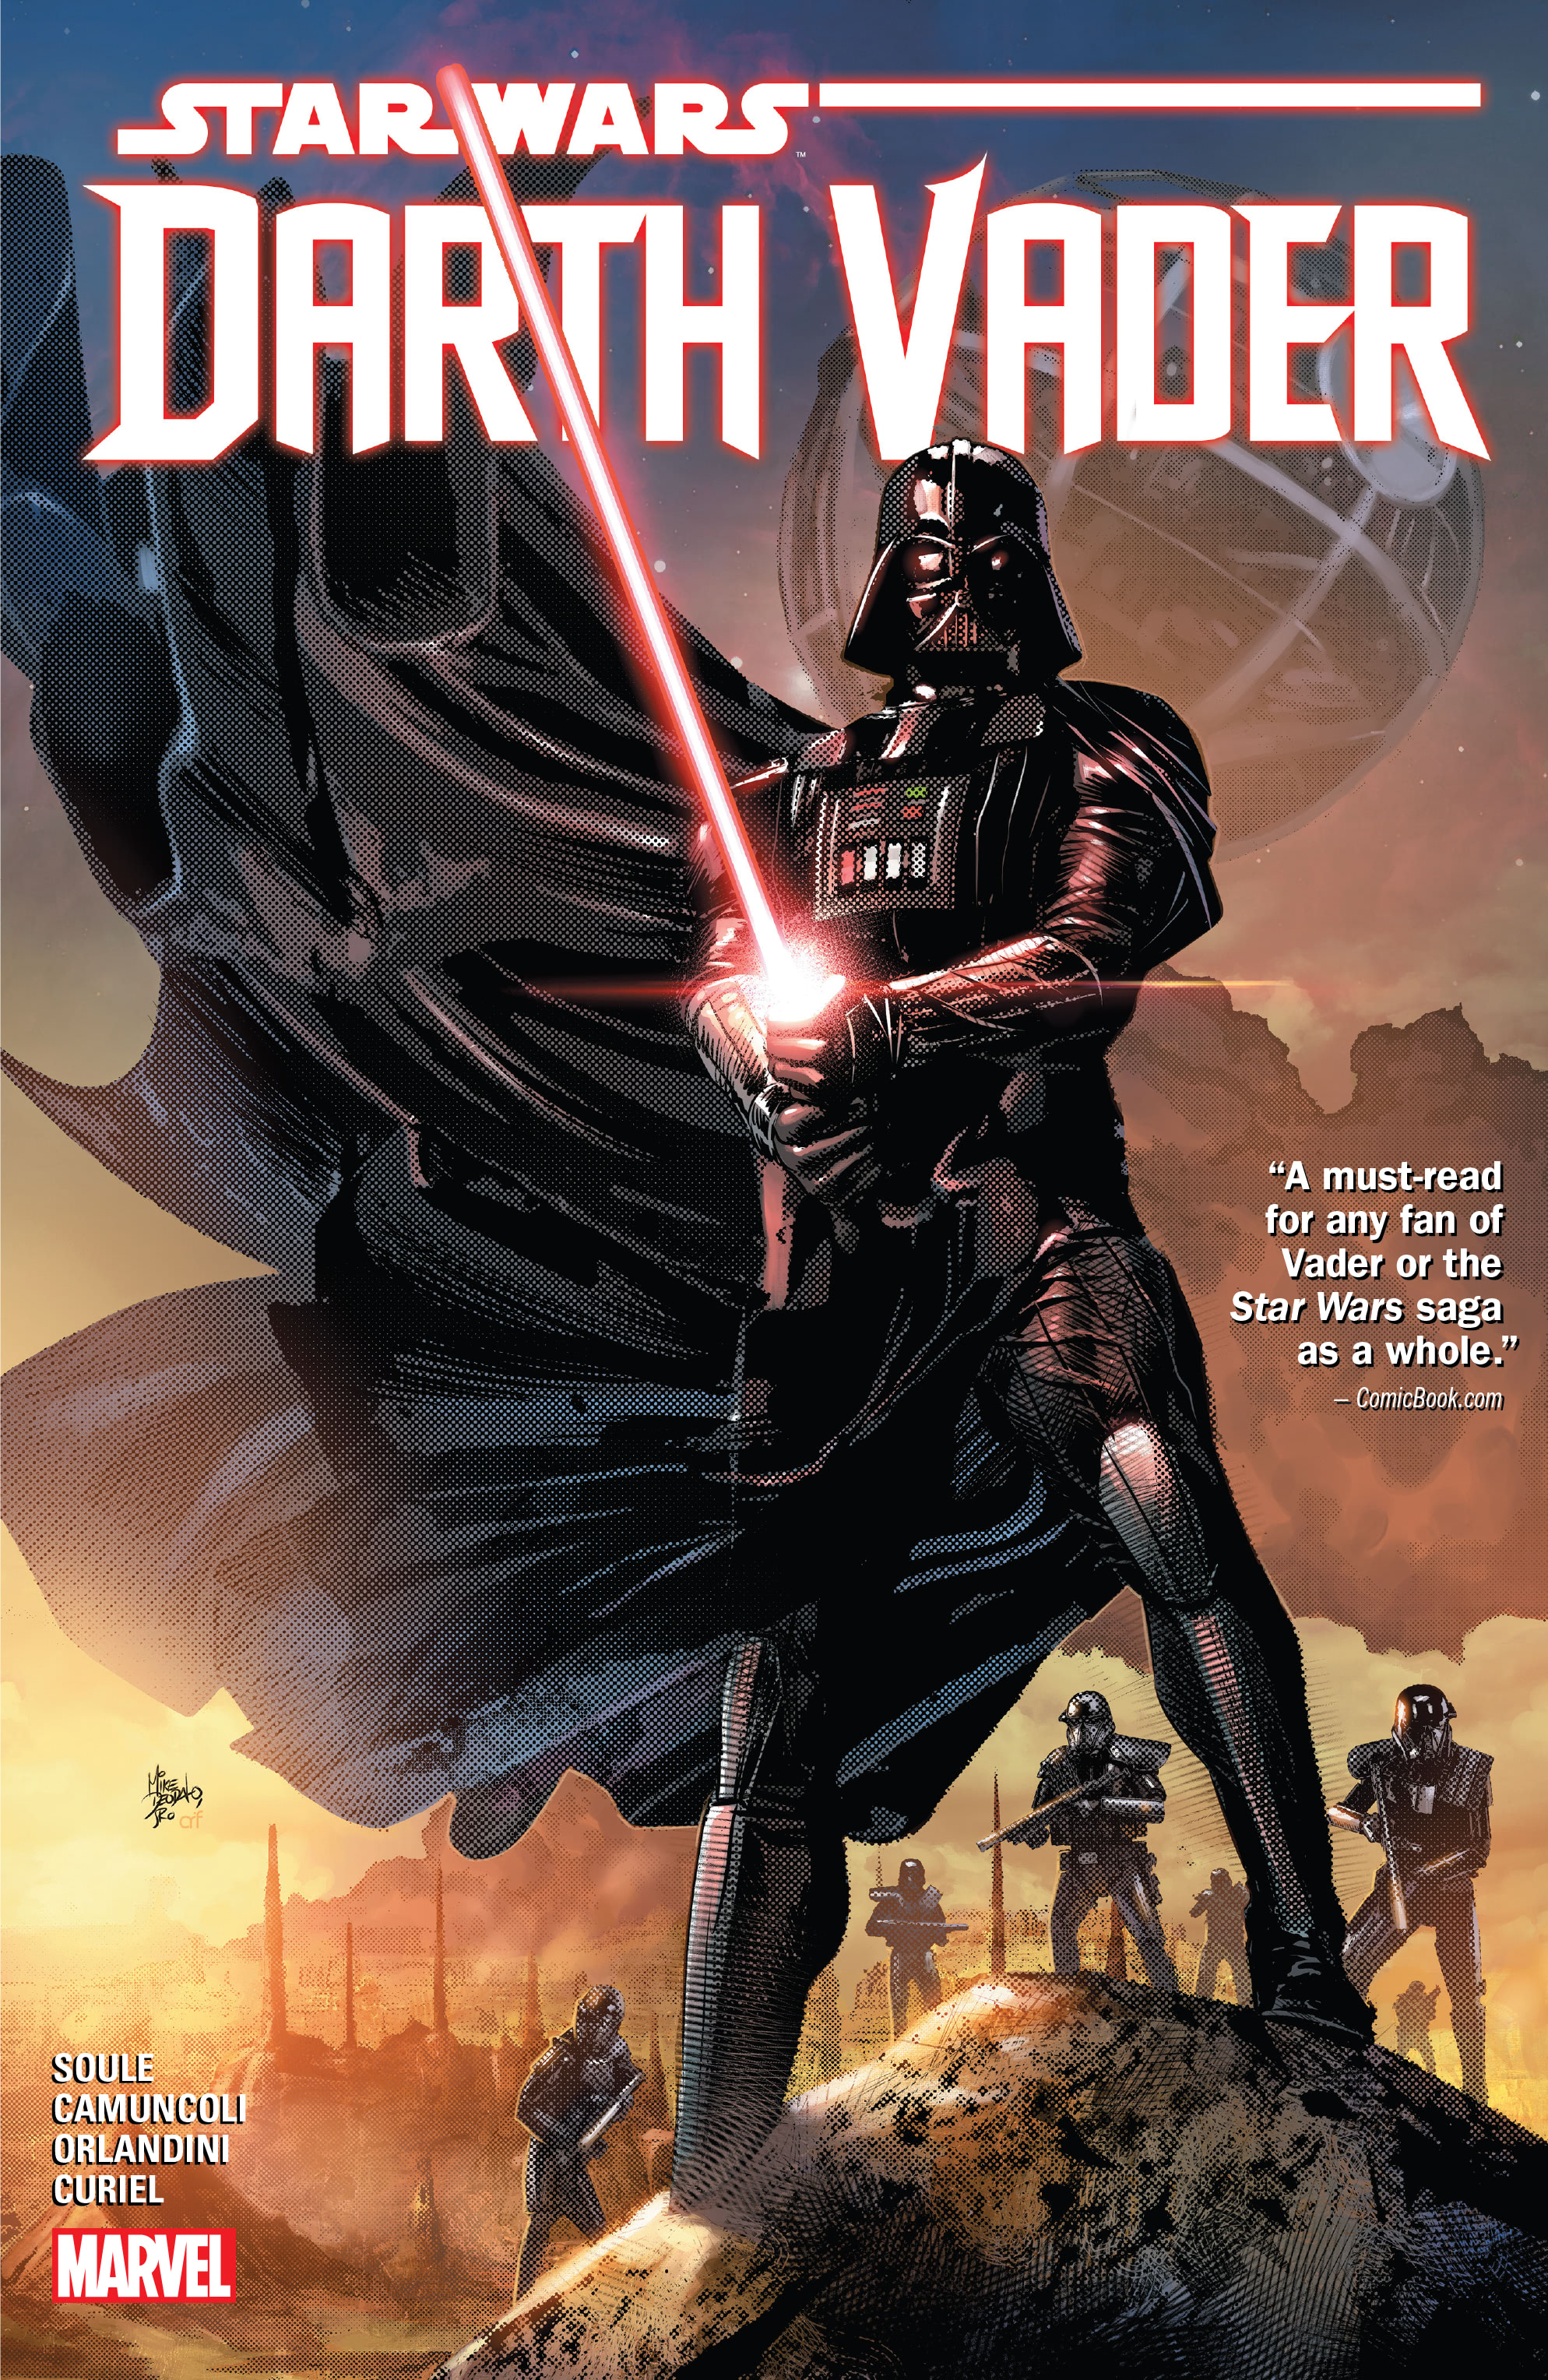 Darth Vader: Dark Lord of the Sith Volume 2 (23.06.2020)